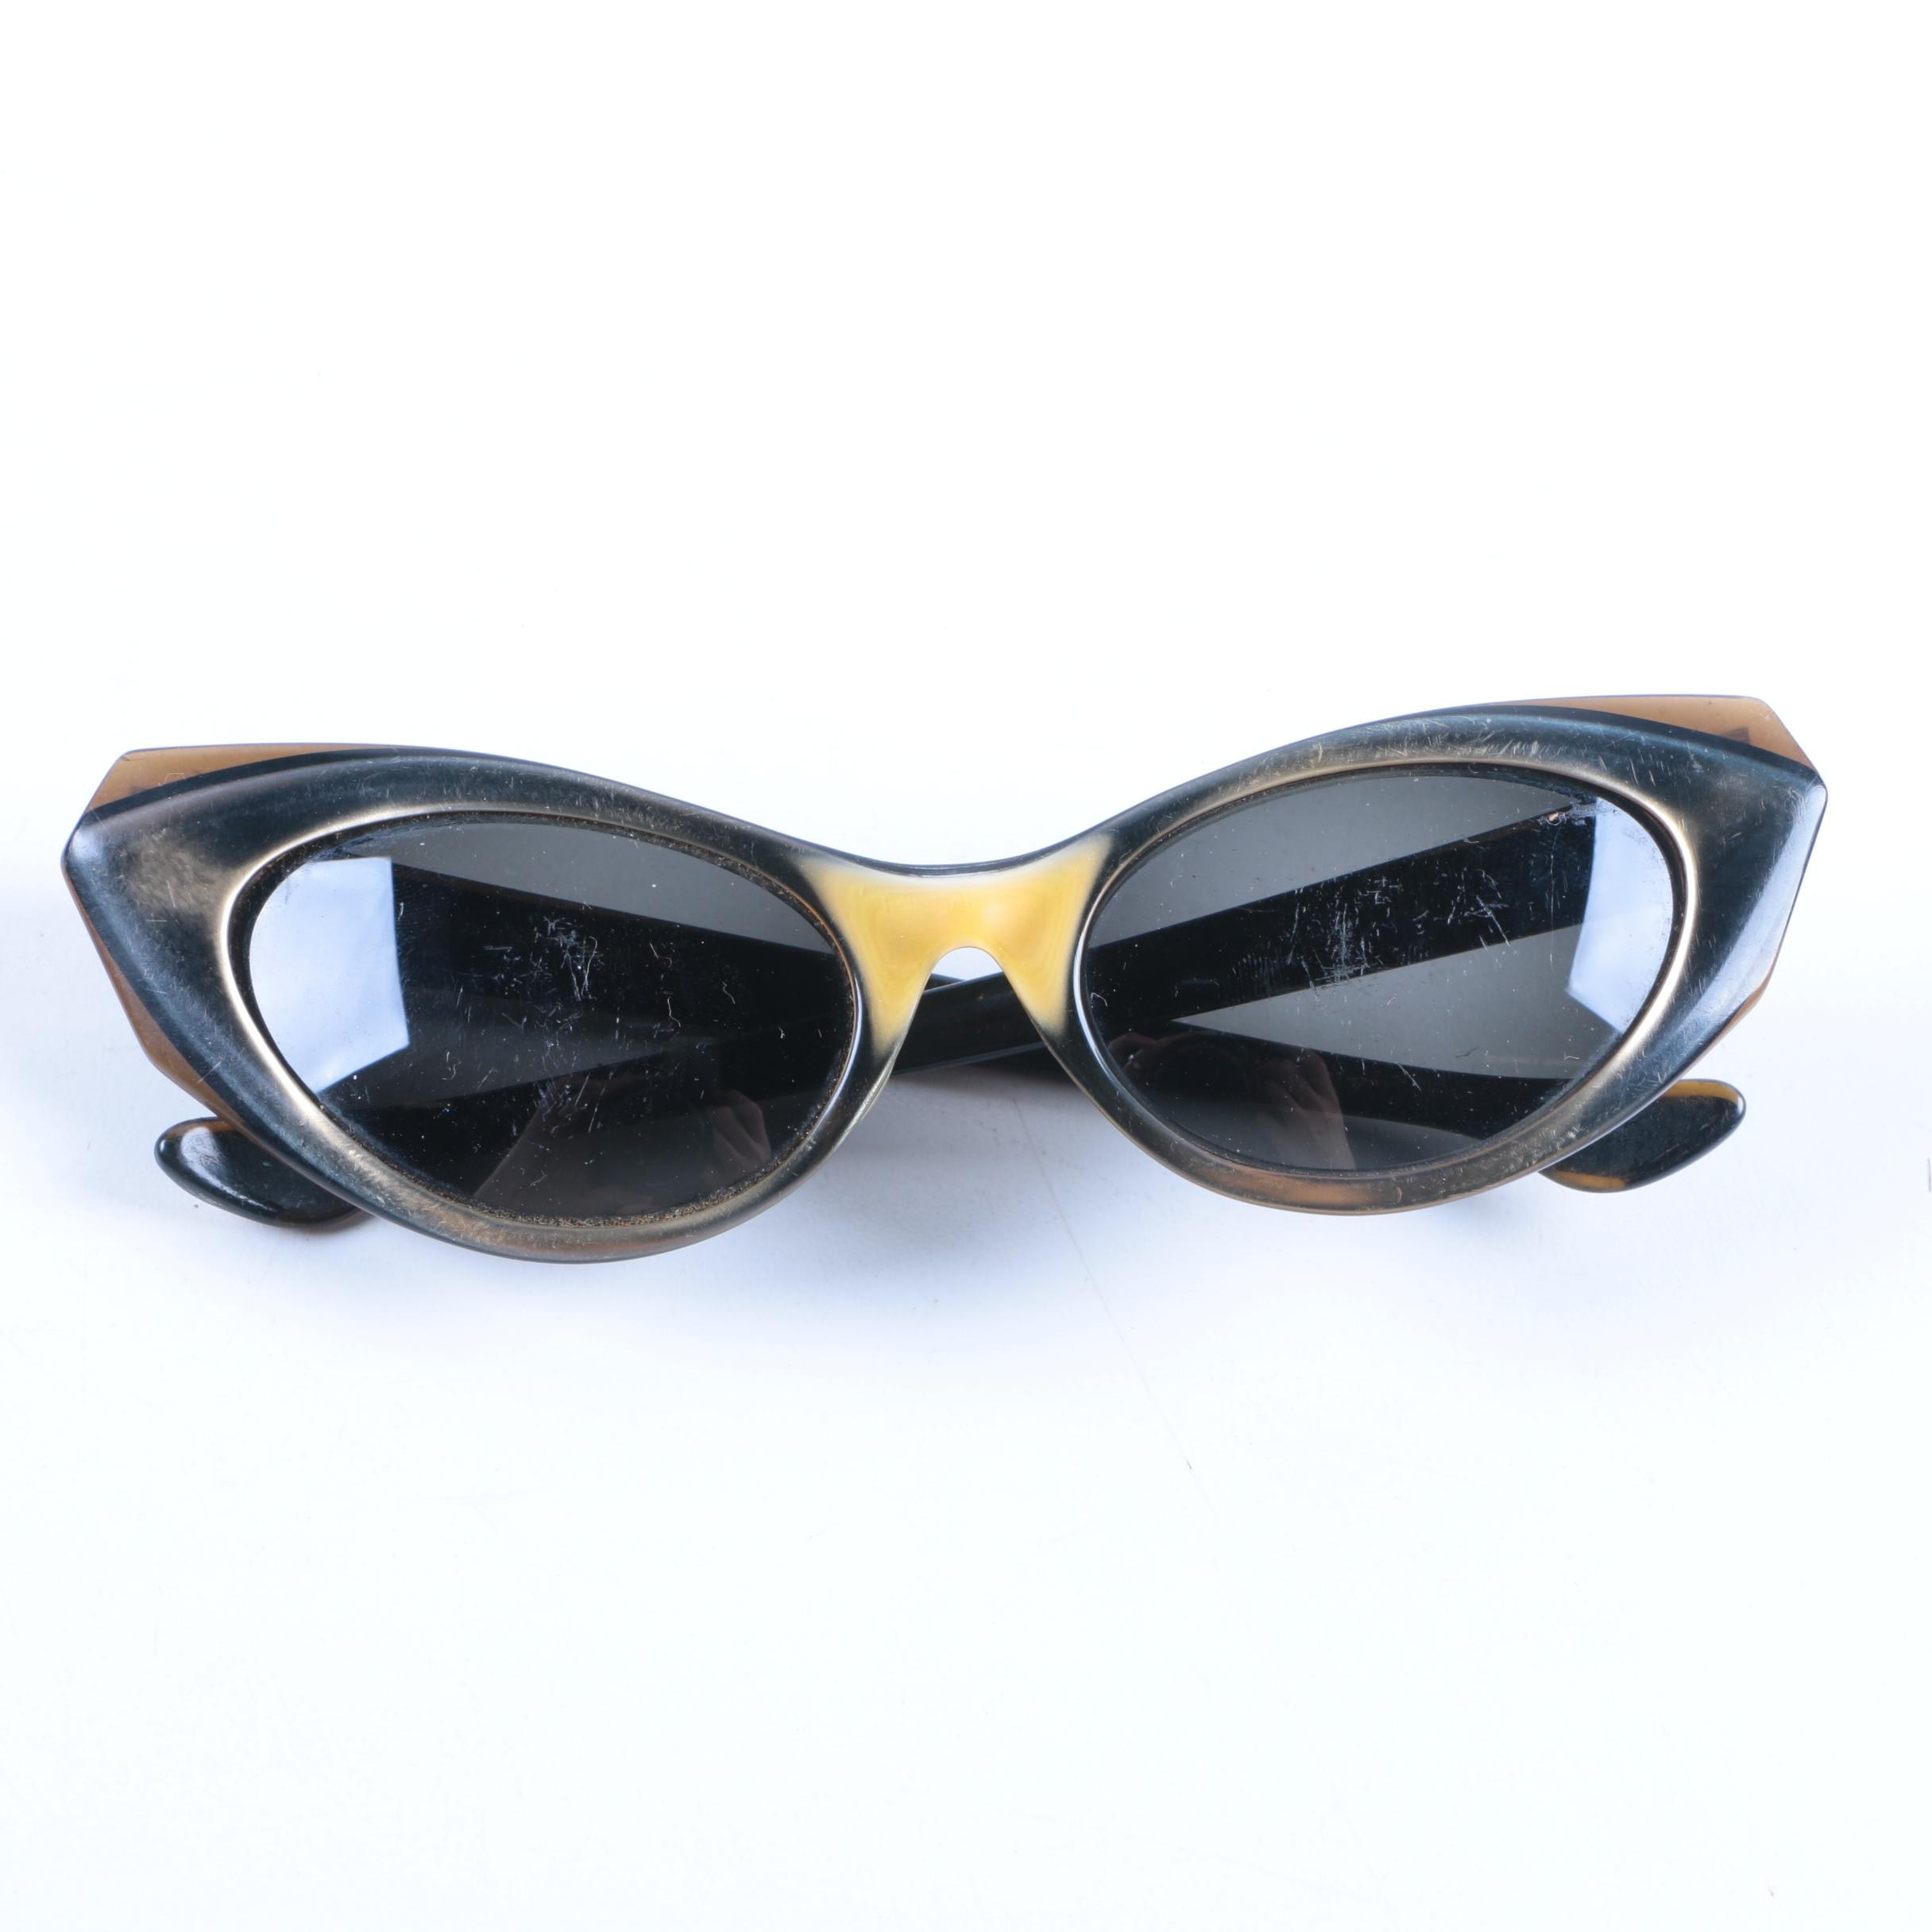 Vintage 1950s B & L Ray-Ban Marche Sunglasses